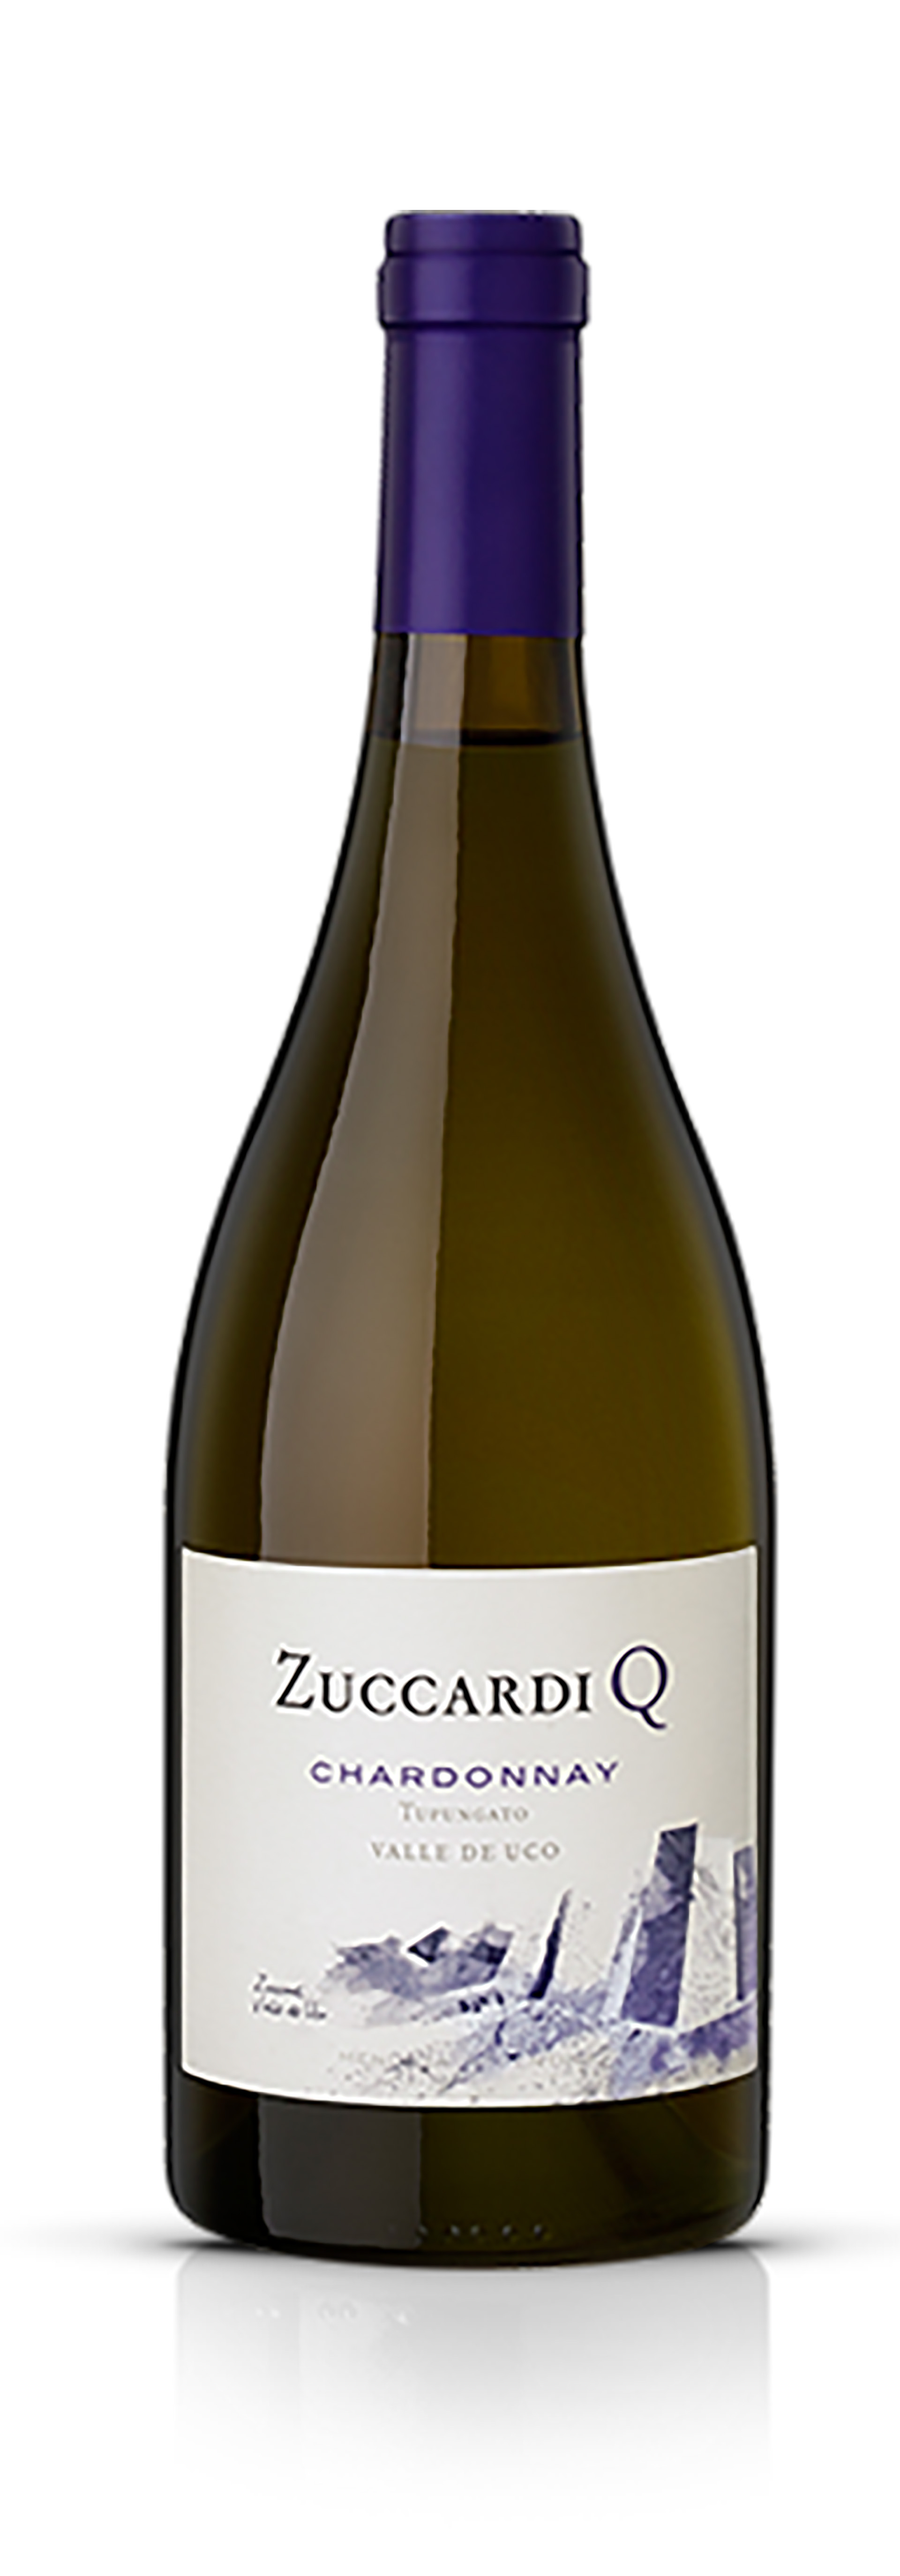 Zuccardi Q Chardonnay 2019